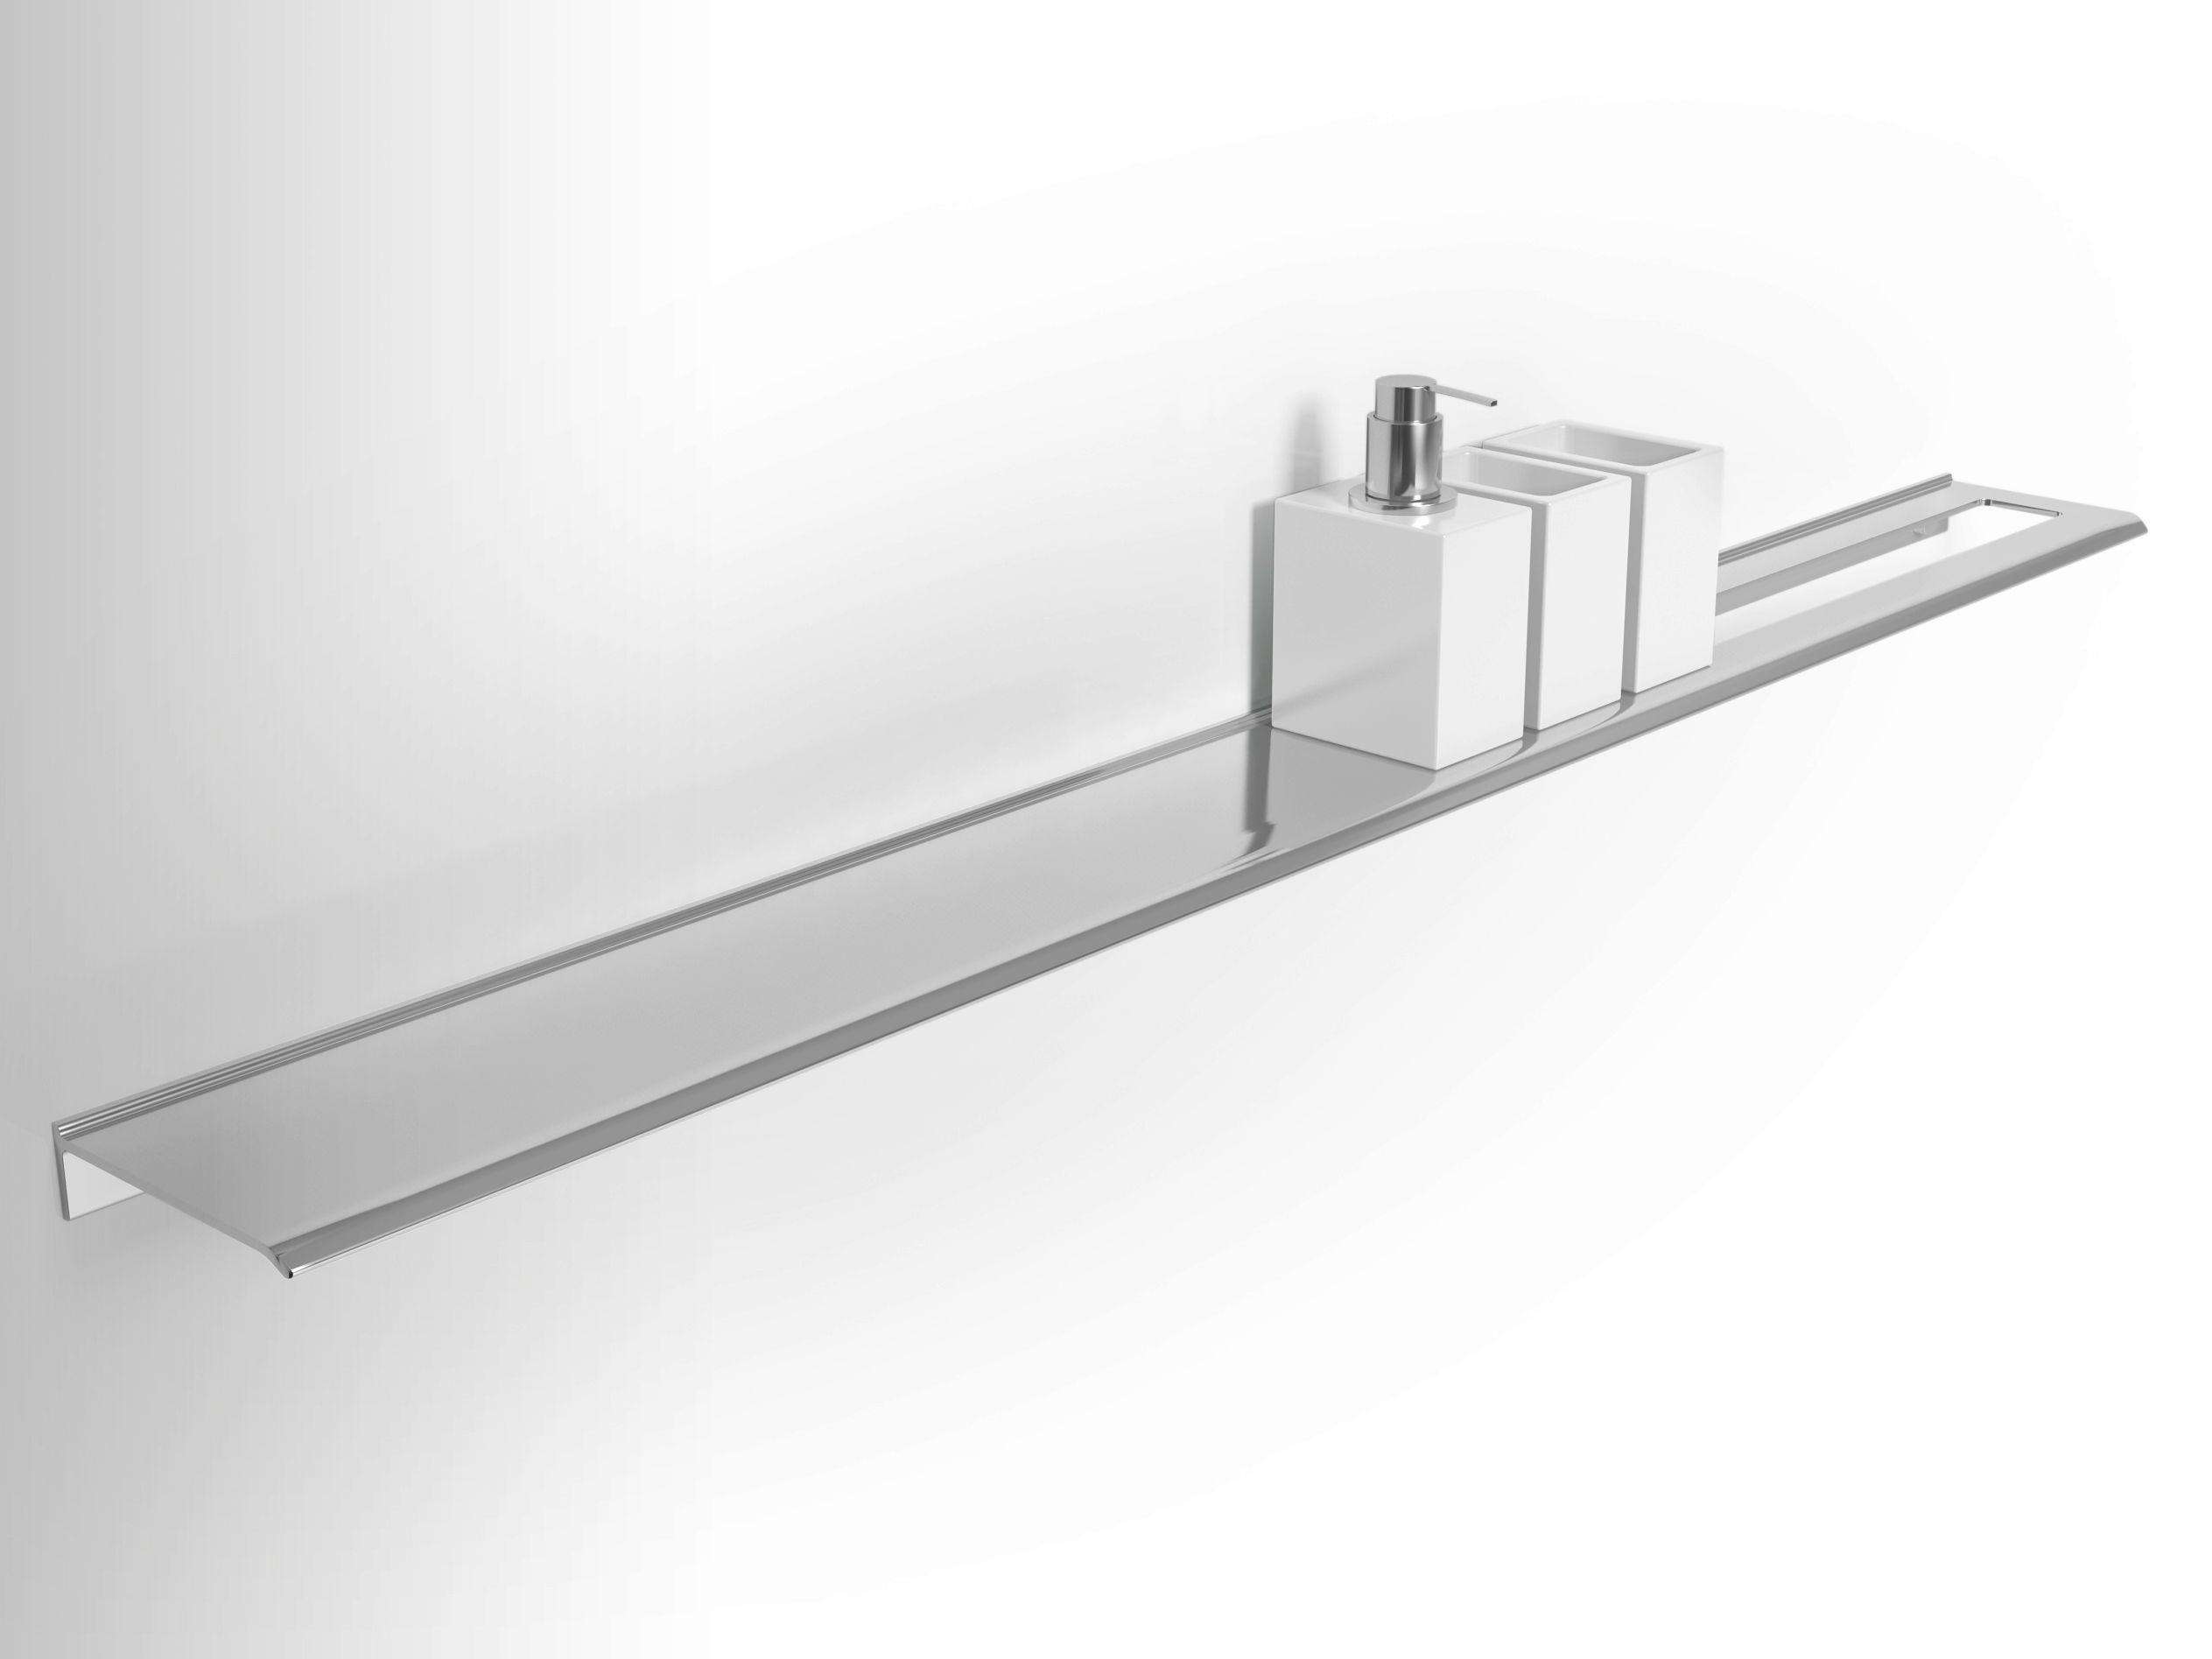 Aluminium Bathroom Wall Shelves Archiproducts